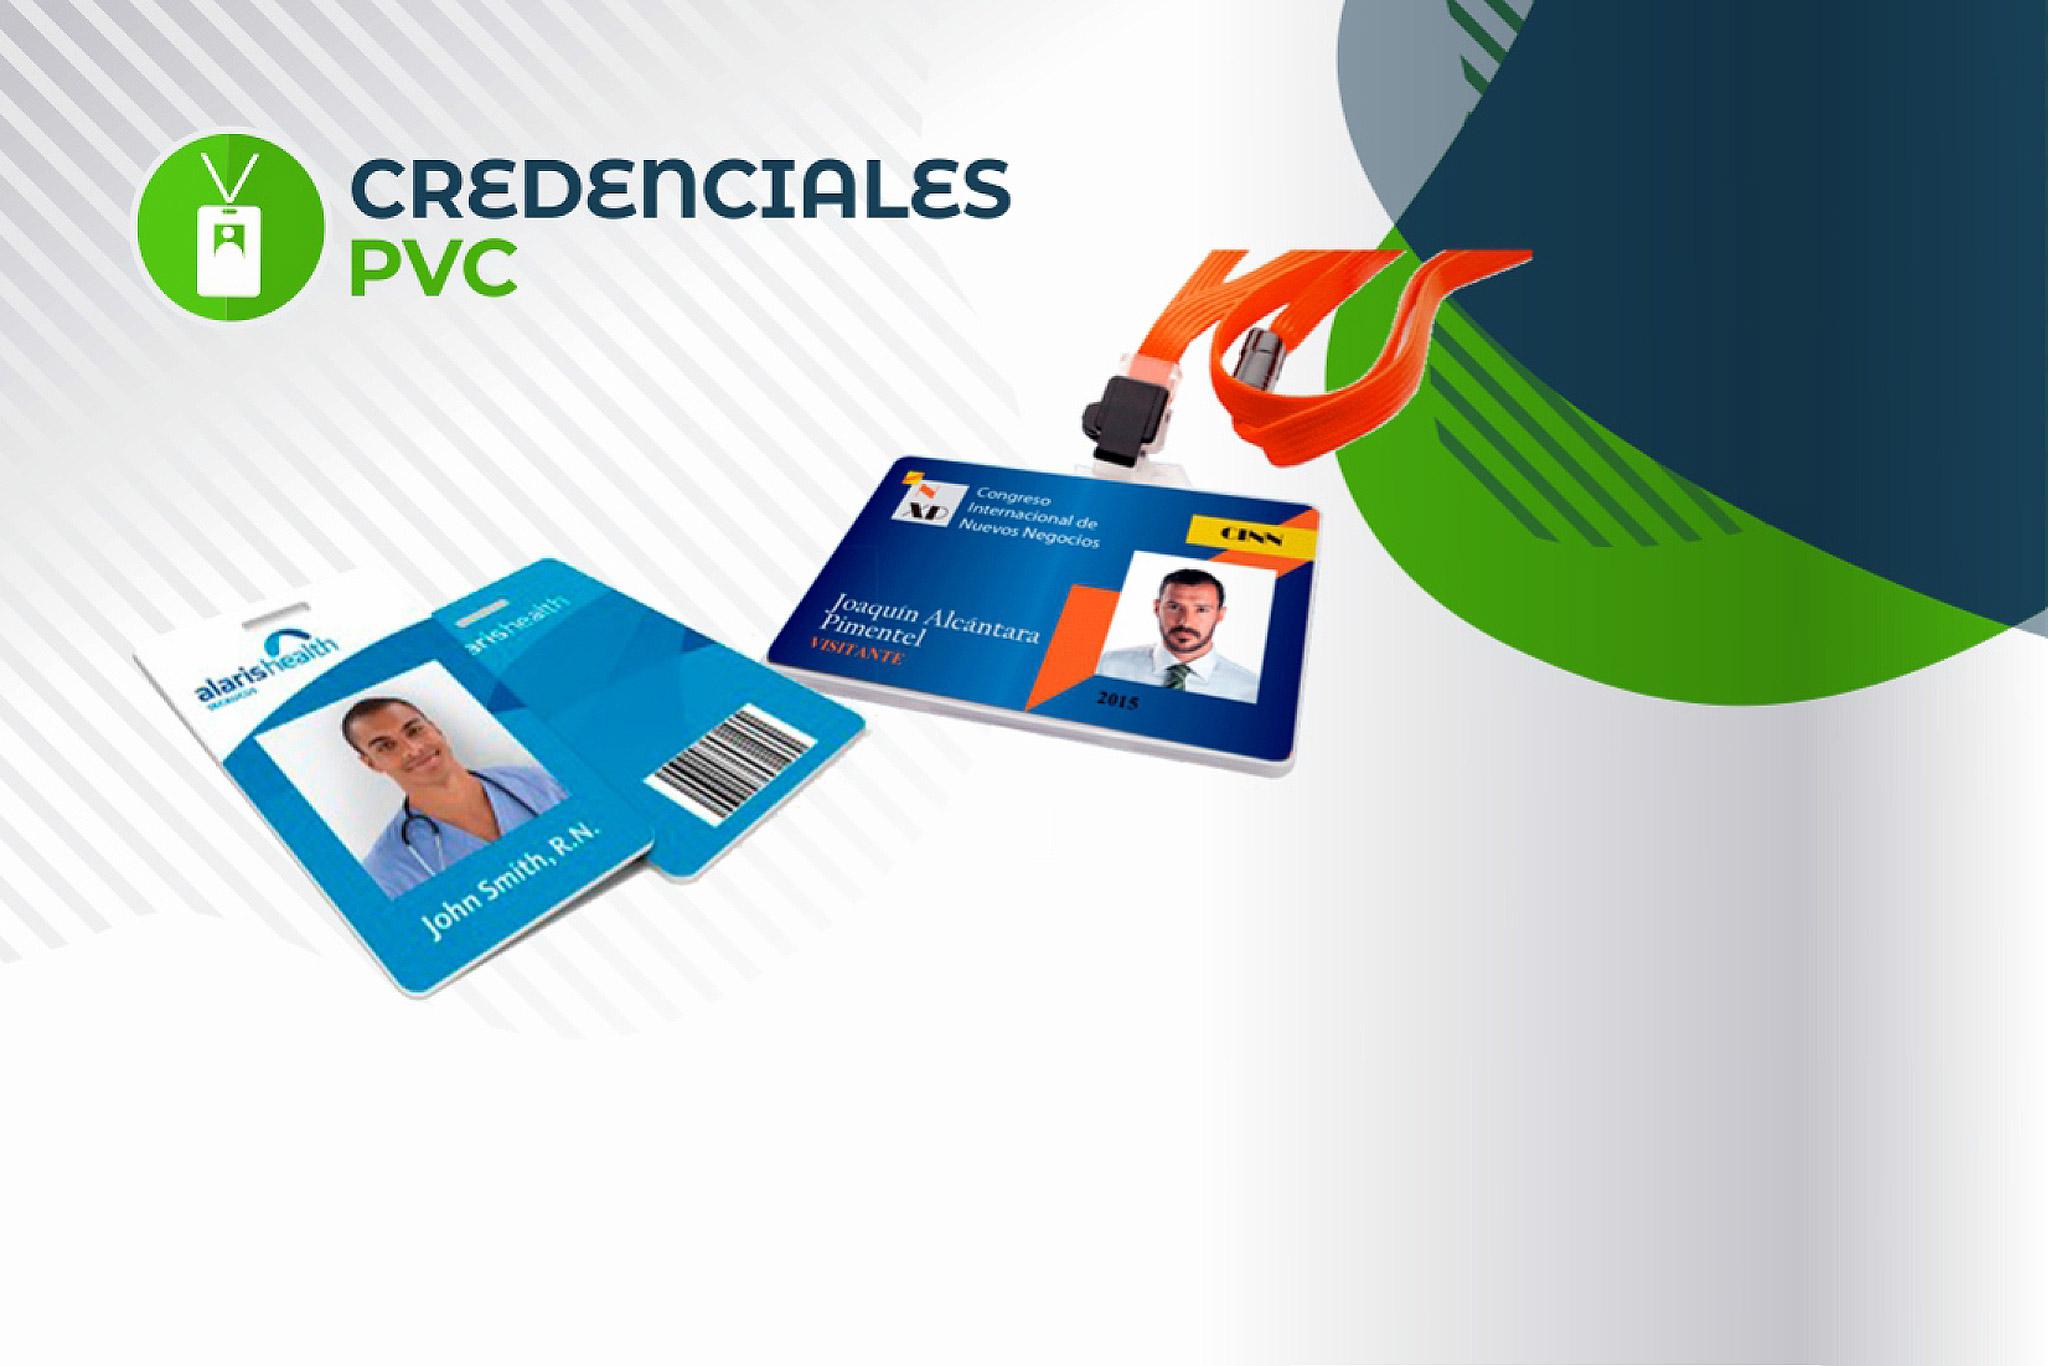 https://ardipu.com/wp-content/uploads/2019/07/credenciales.jpg